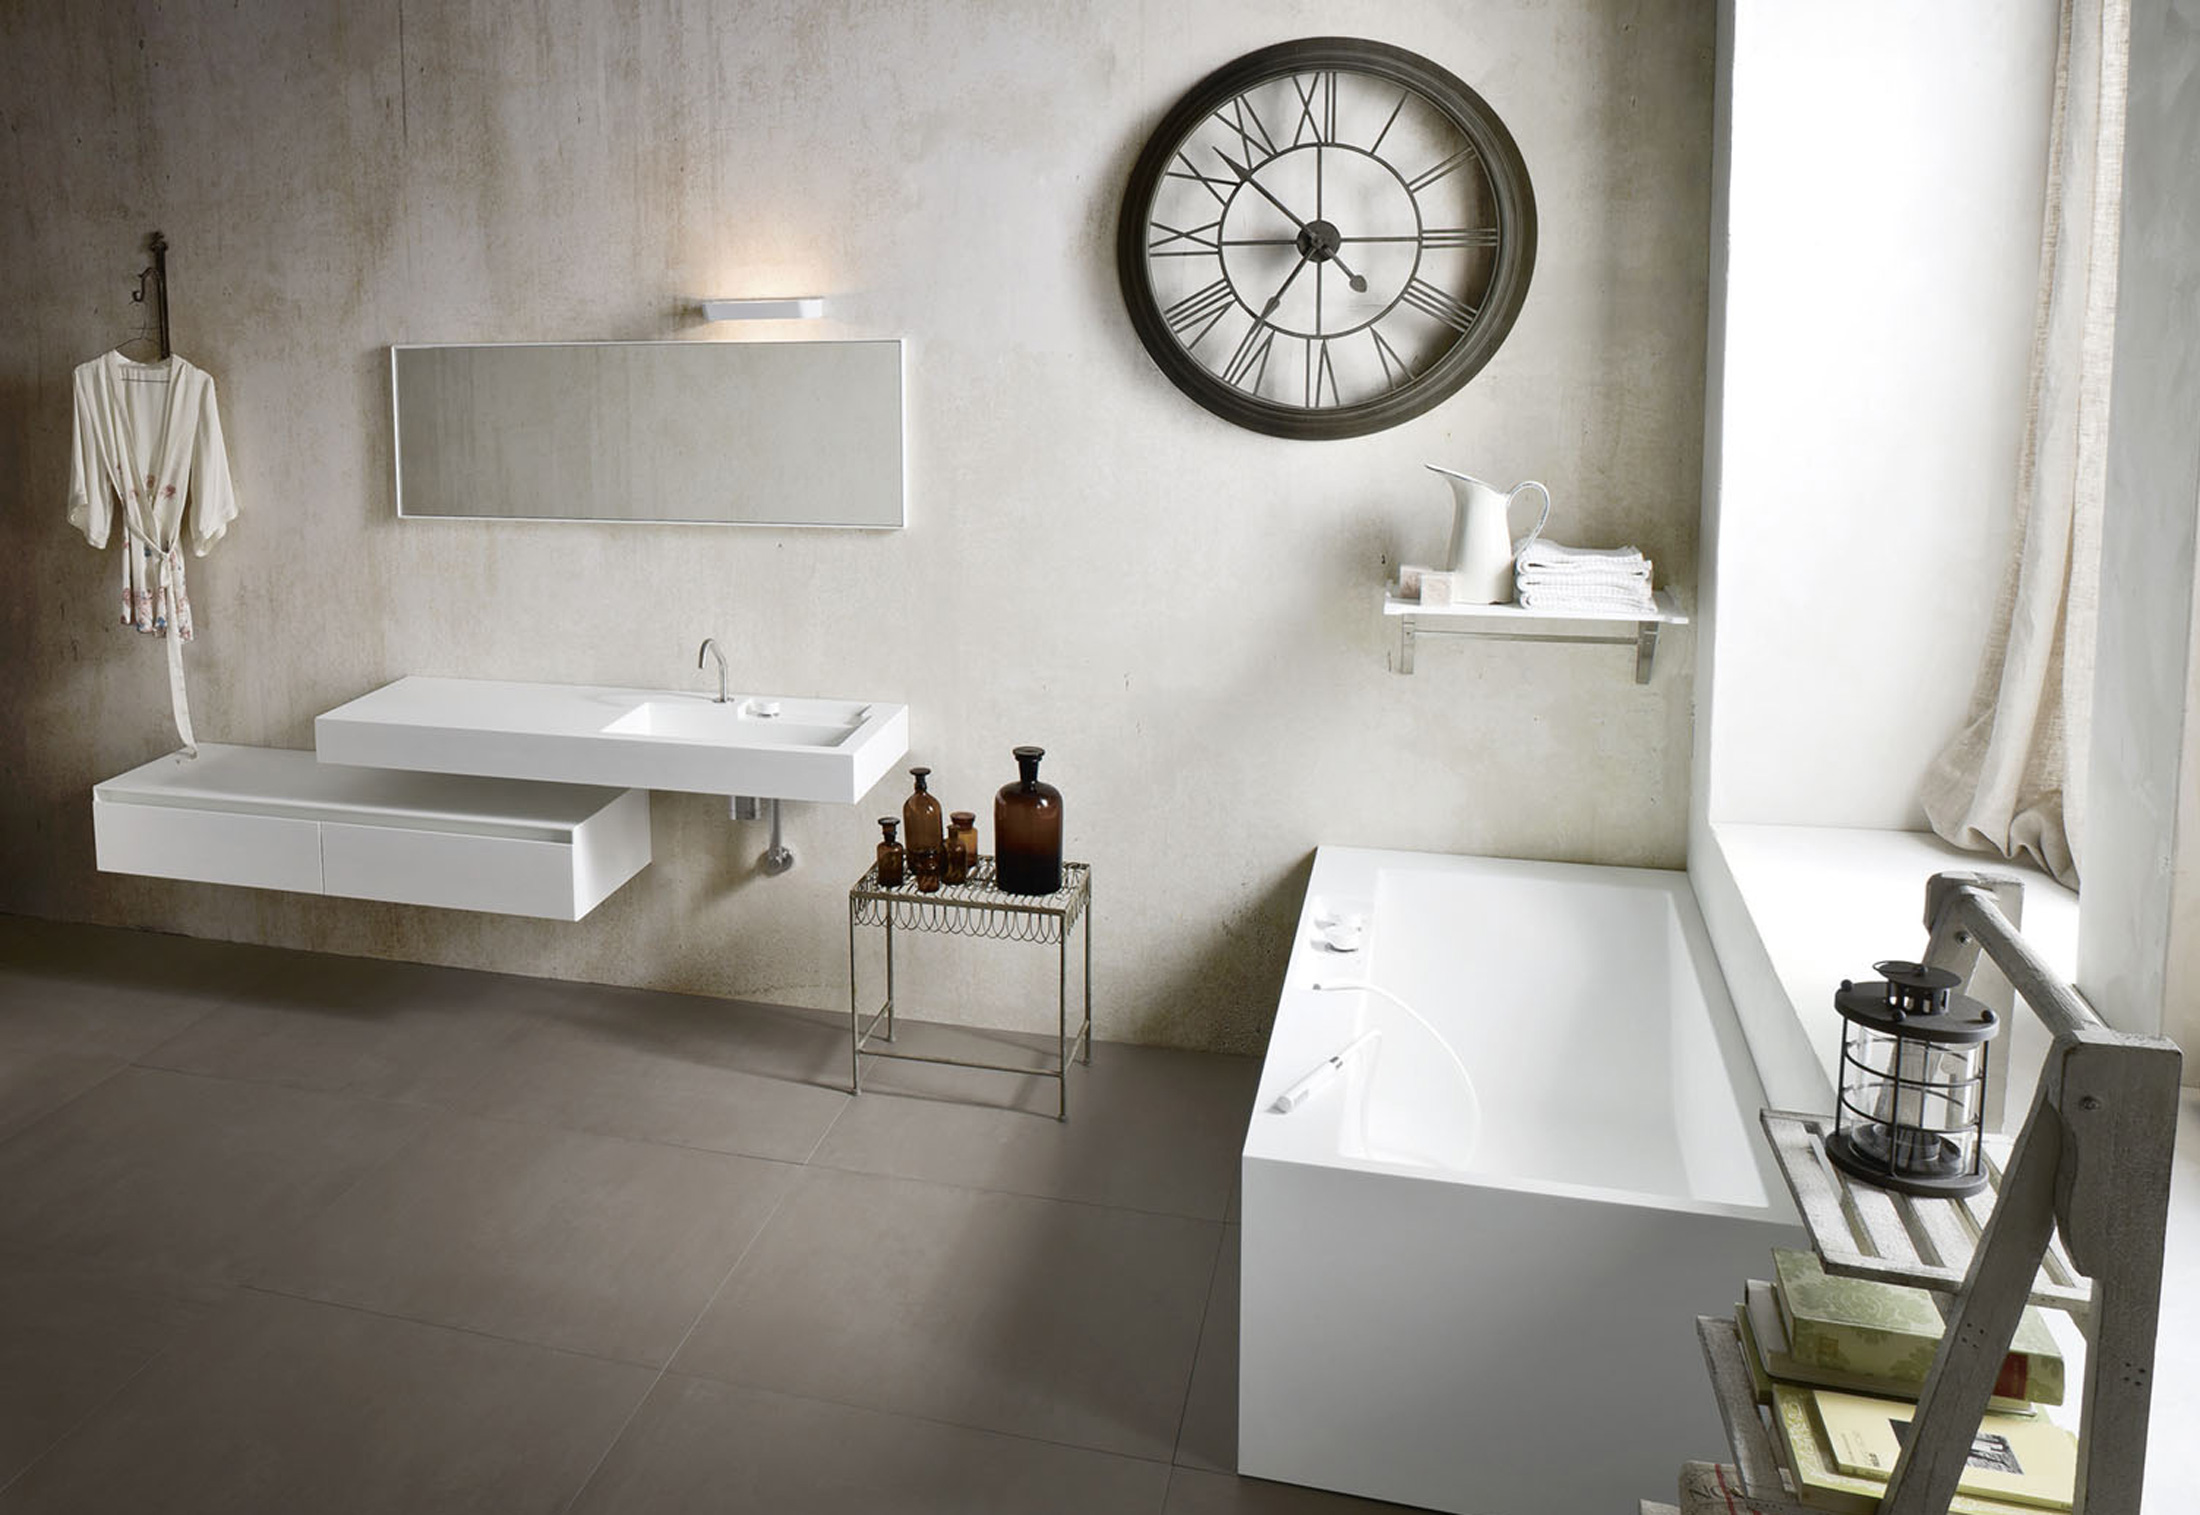 ergo nomic bathtub by rexa design stylepark. Black Bedroom Furniture Sets. Home Design Ideas